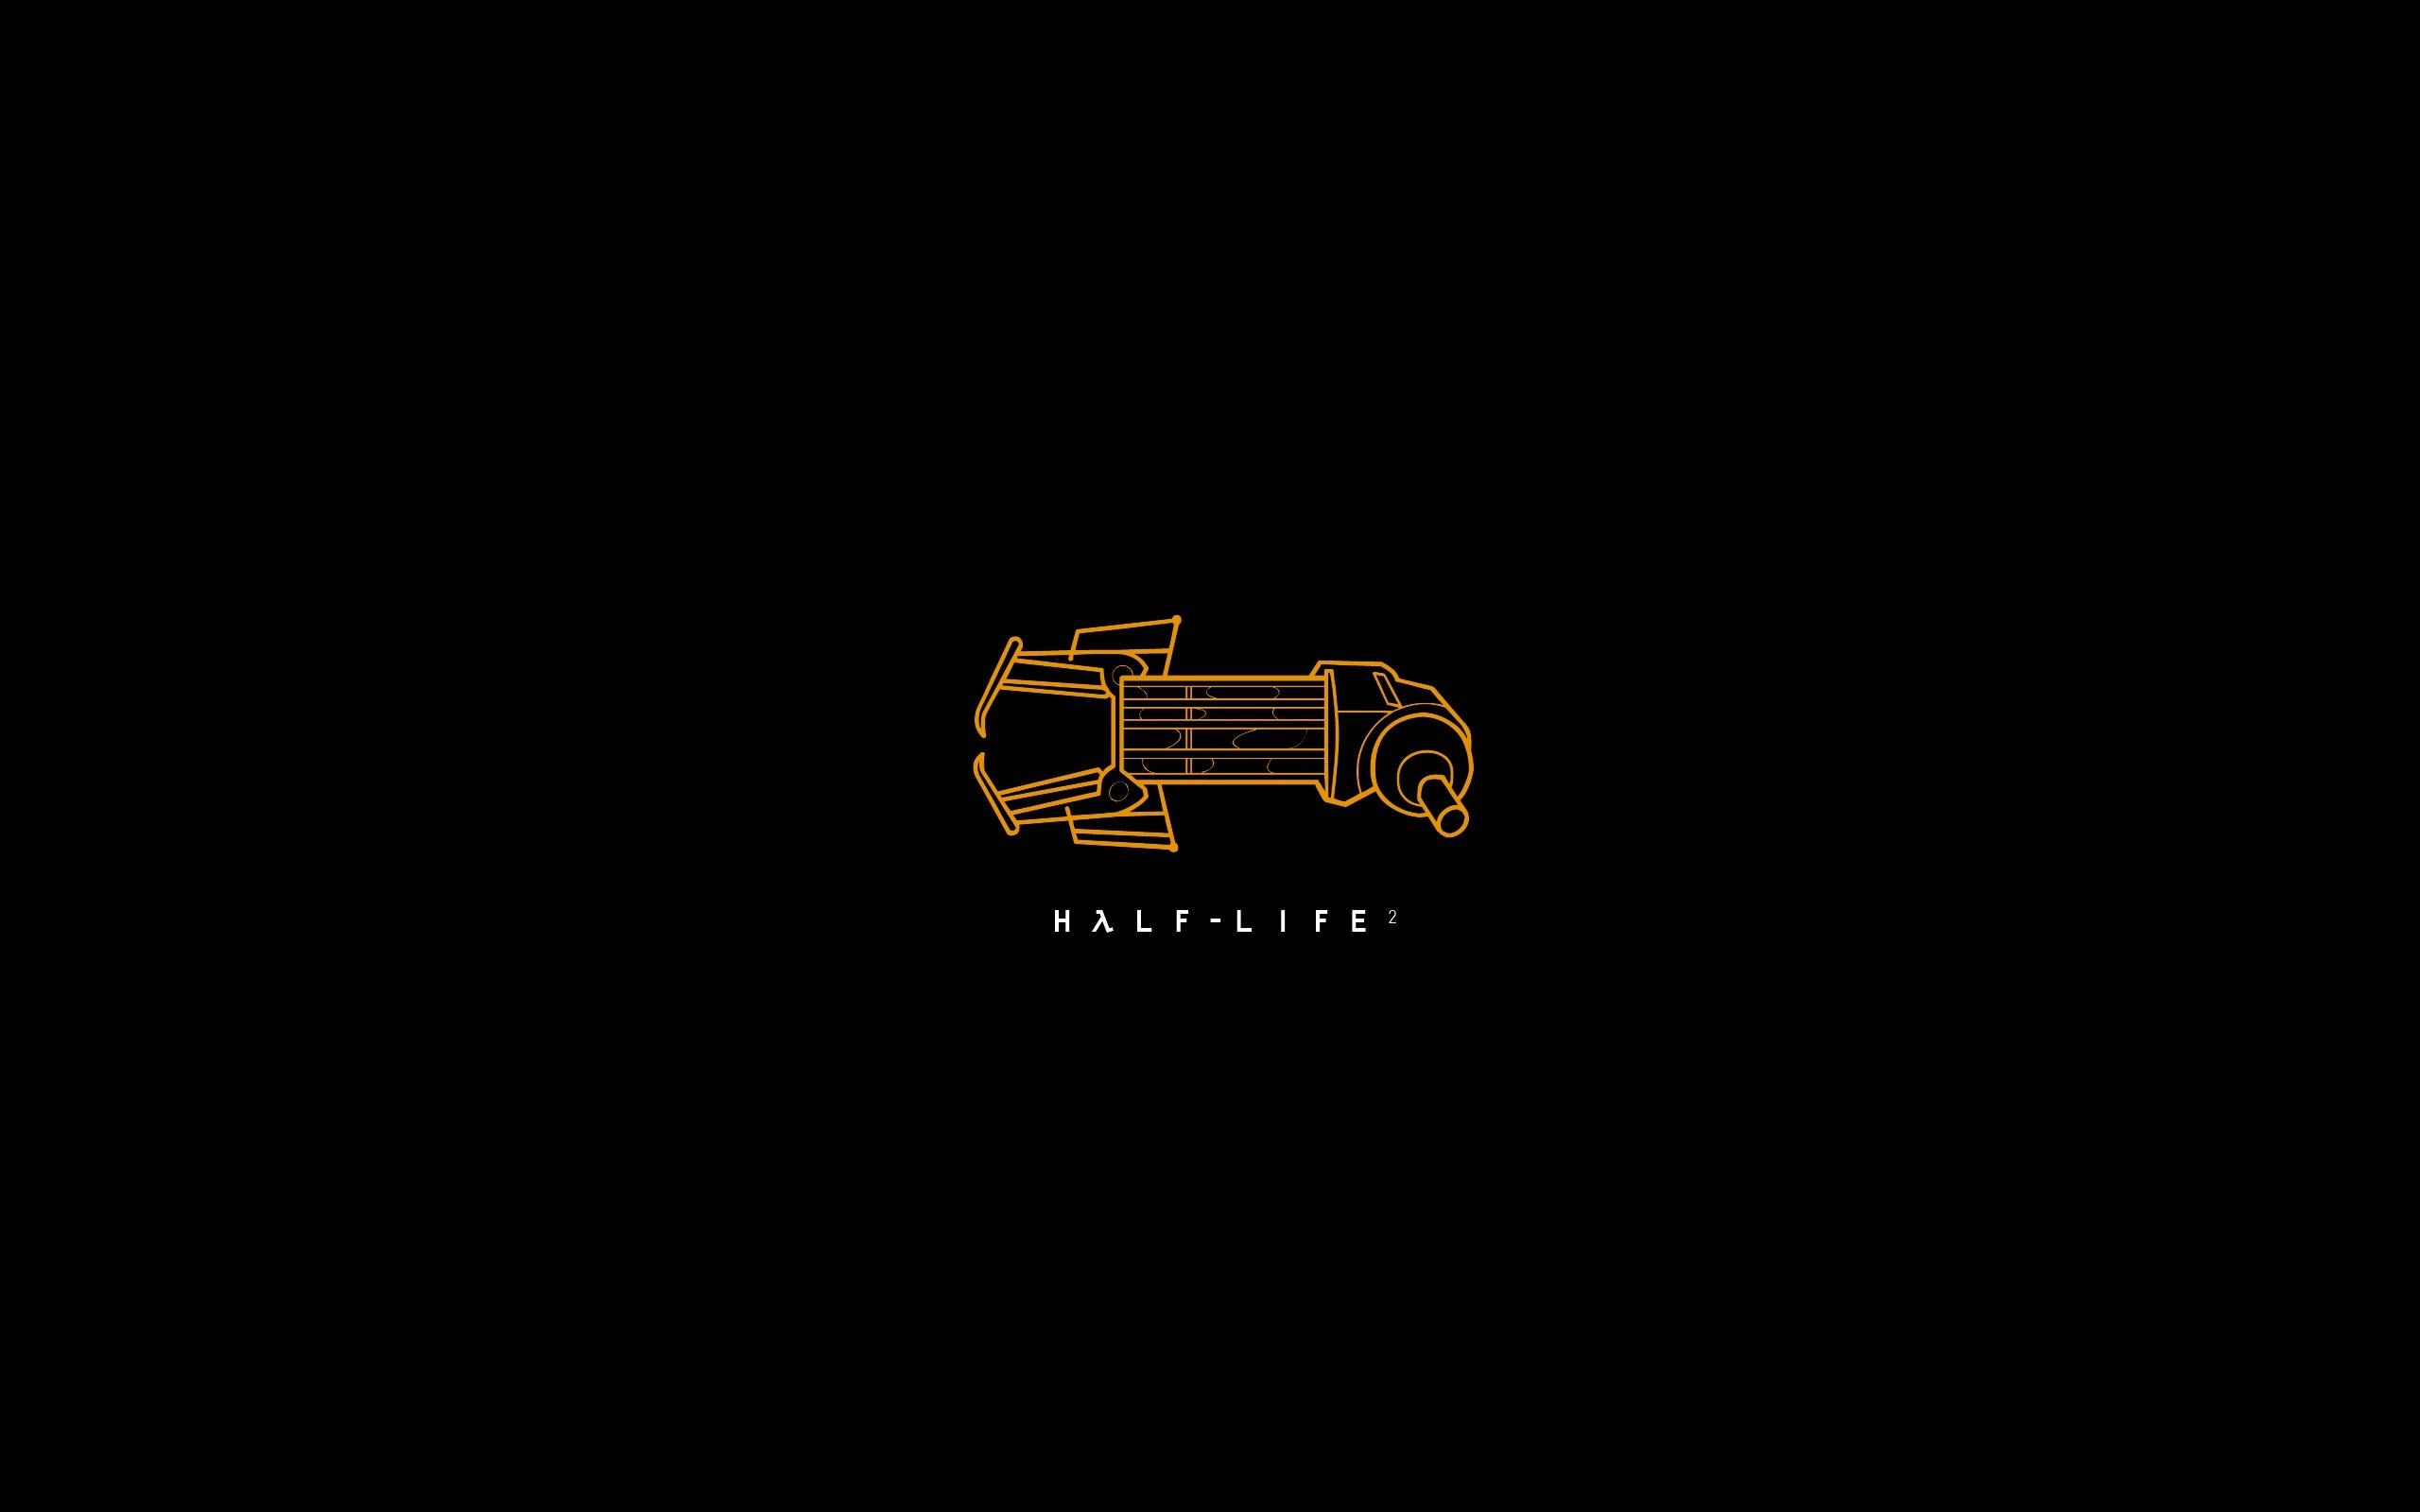 Wallpaper Half-life 2, Gravity gun, Art, Logo